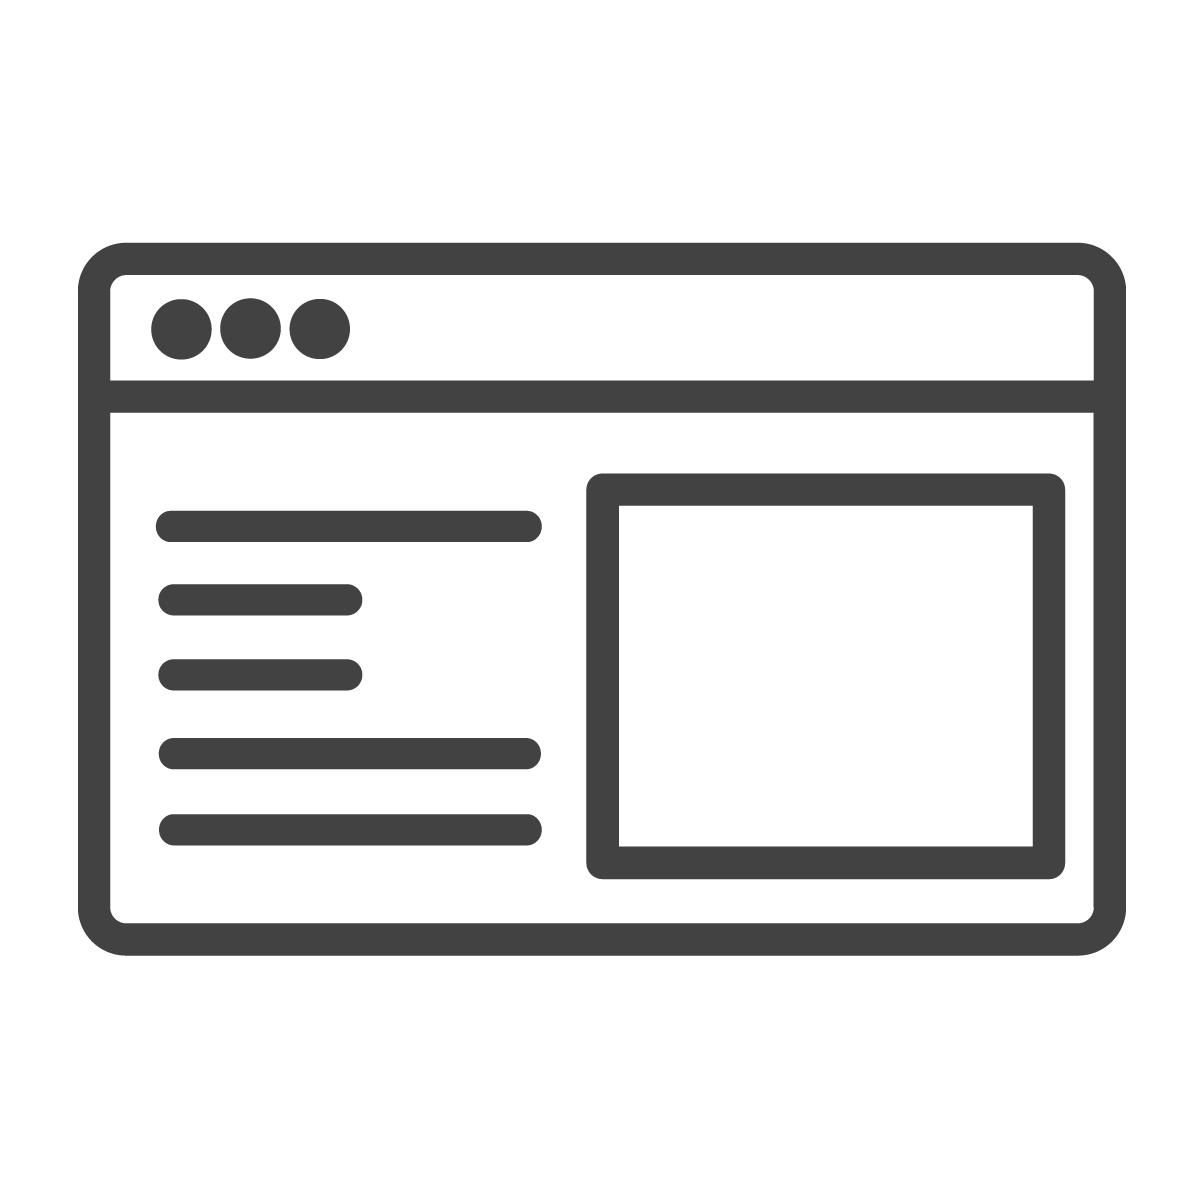 web_altsArtboard 1@2x.png